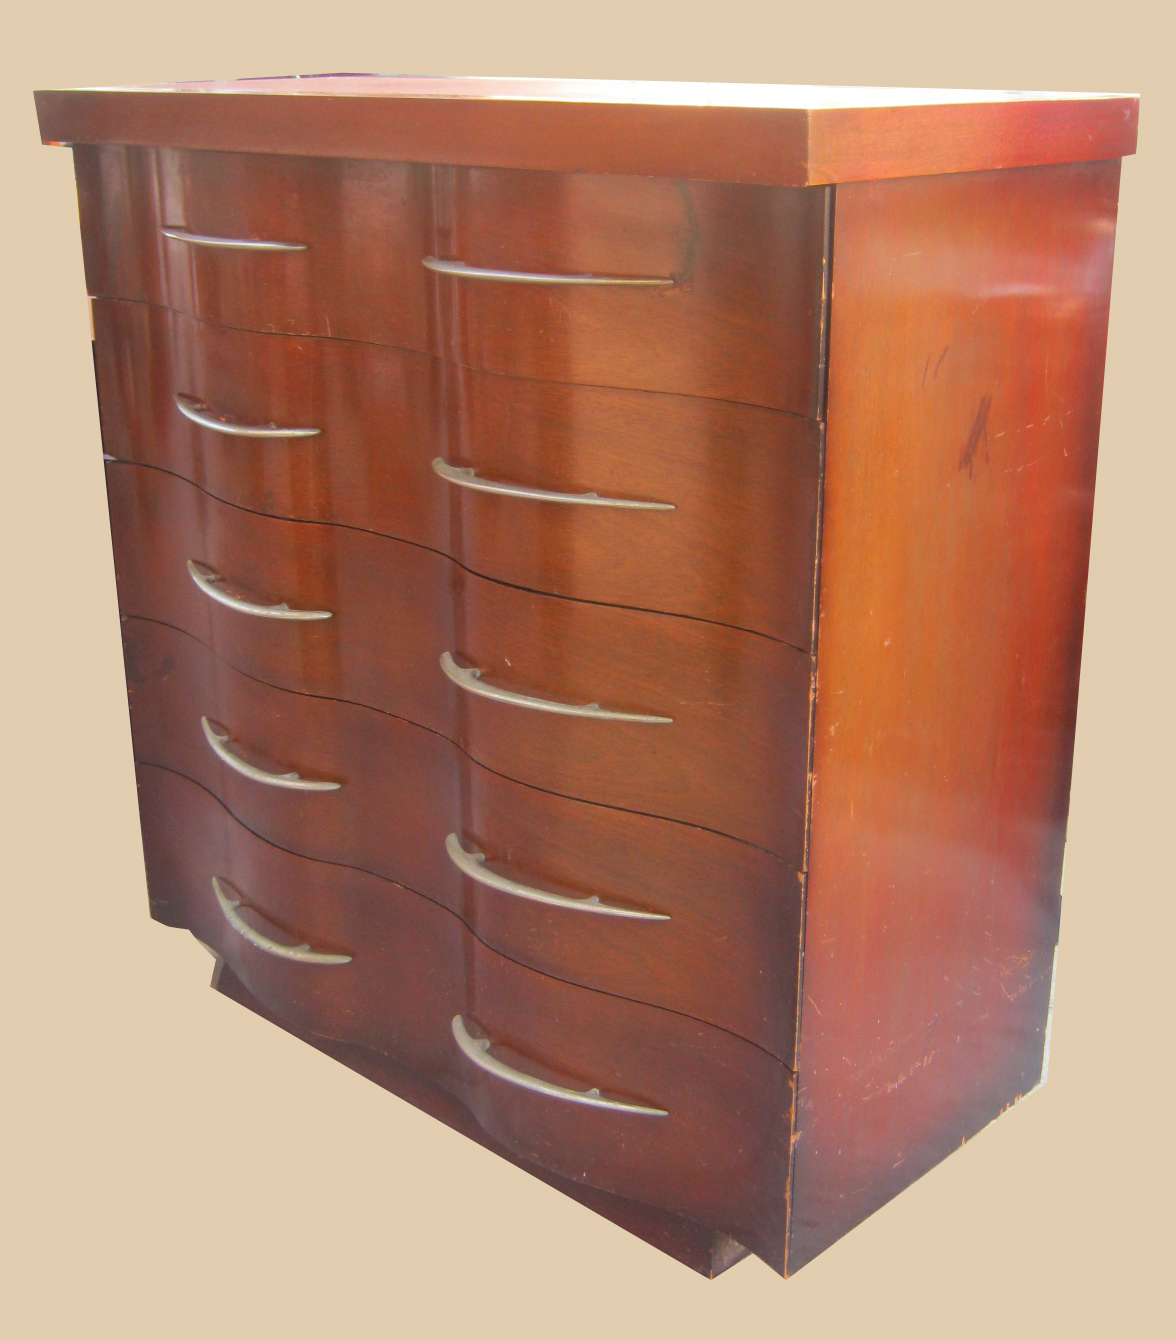 Uhuru Furniture & Collectibles Mahogany Bedroom Furniture